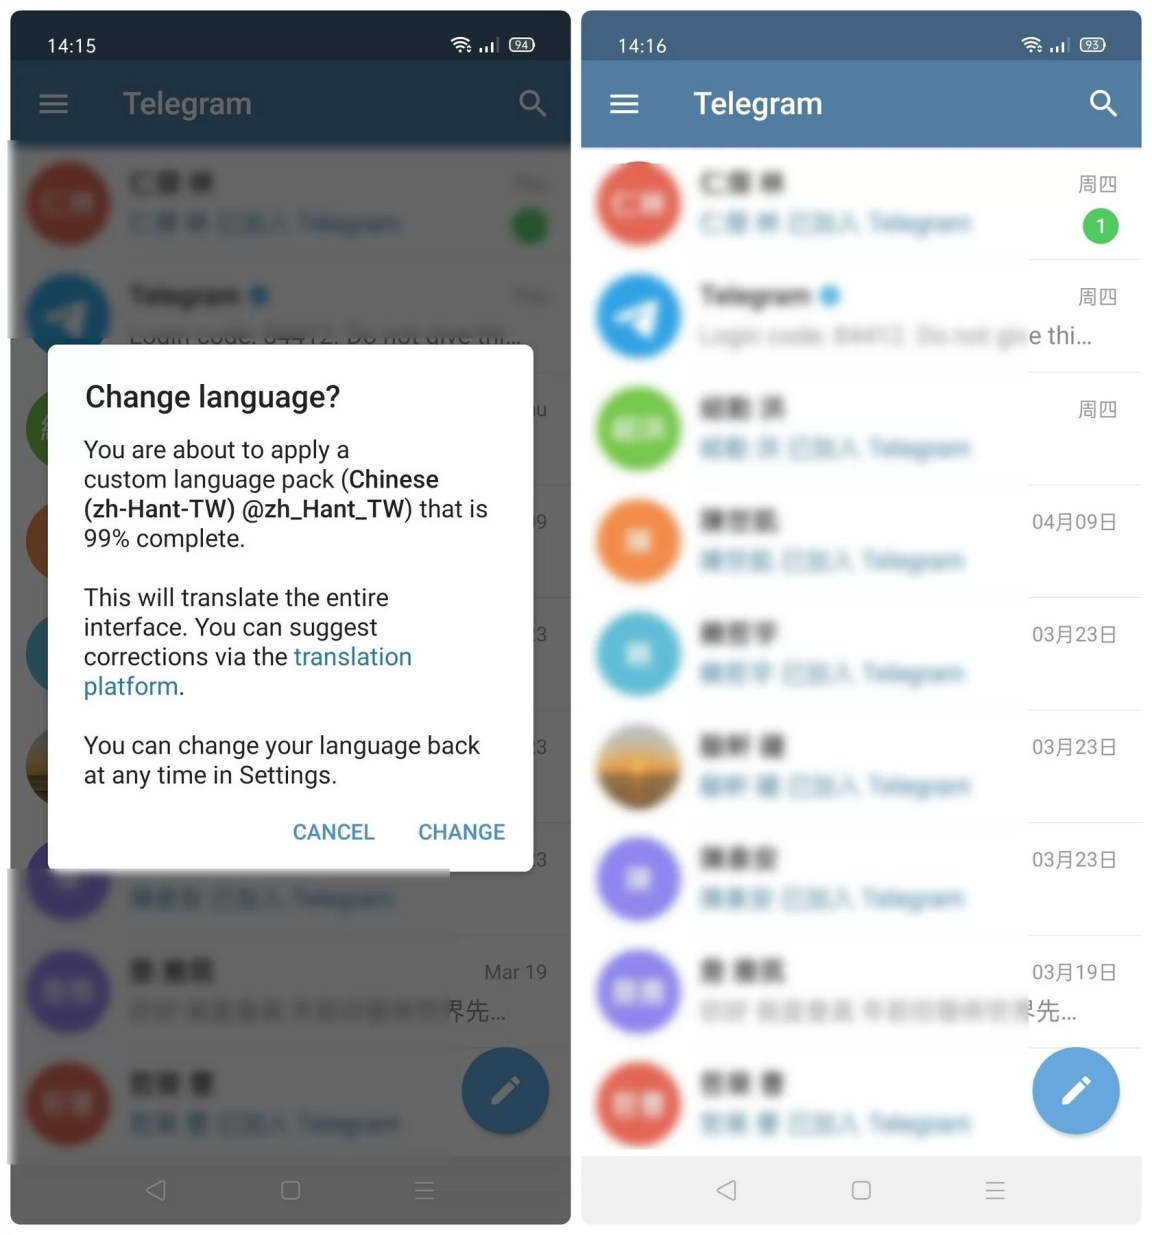 Telegram App如何將語言改為中文 中文化的設定如何進行